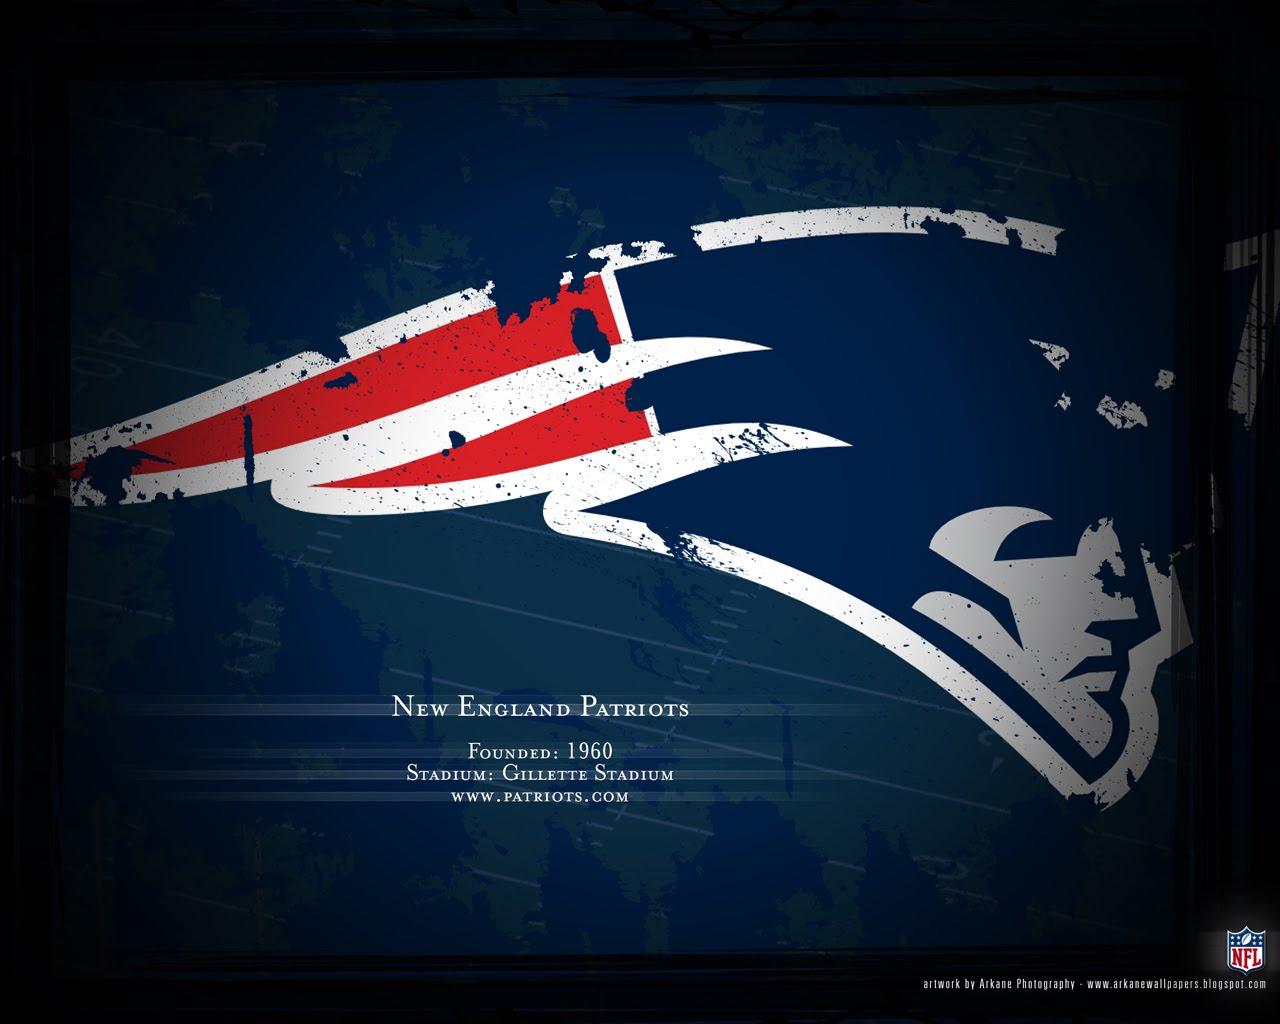 New England Patriots Cake Ideas and Designs 1280x1024